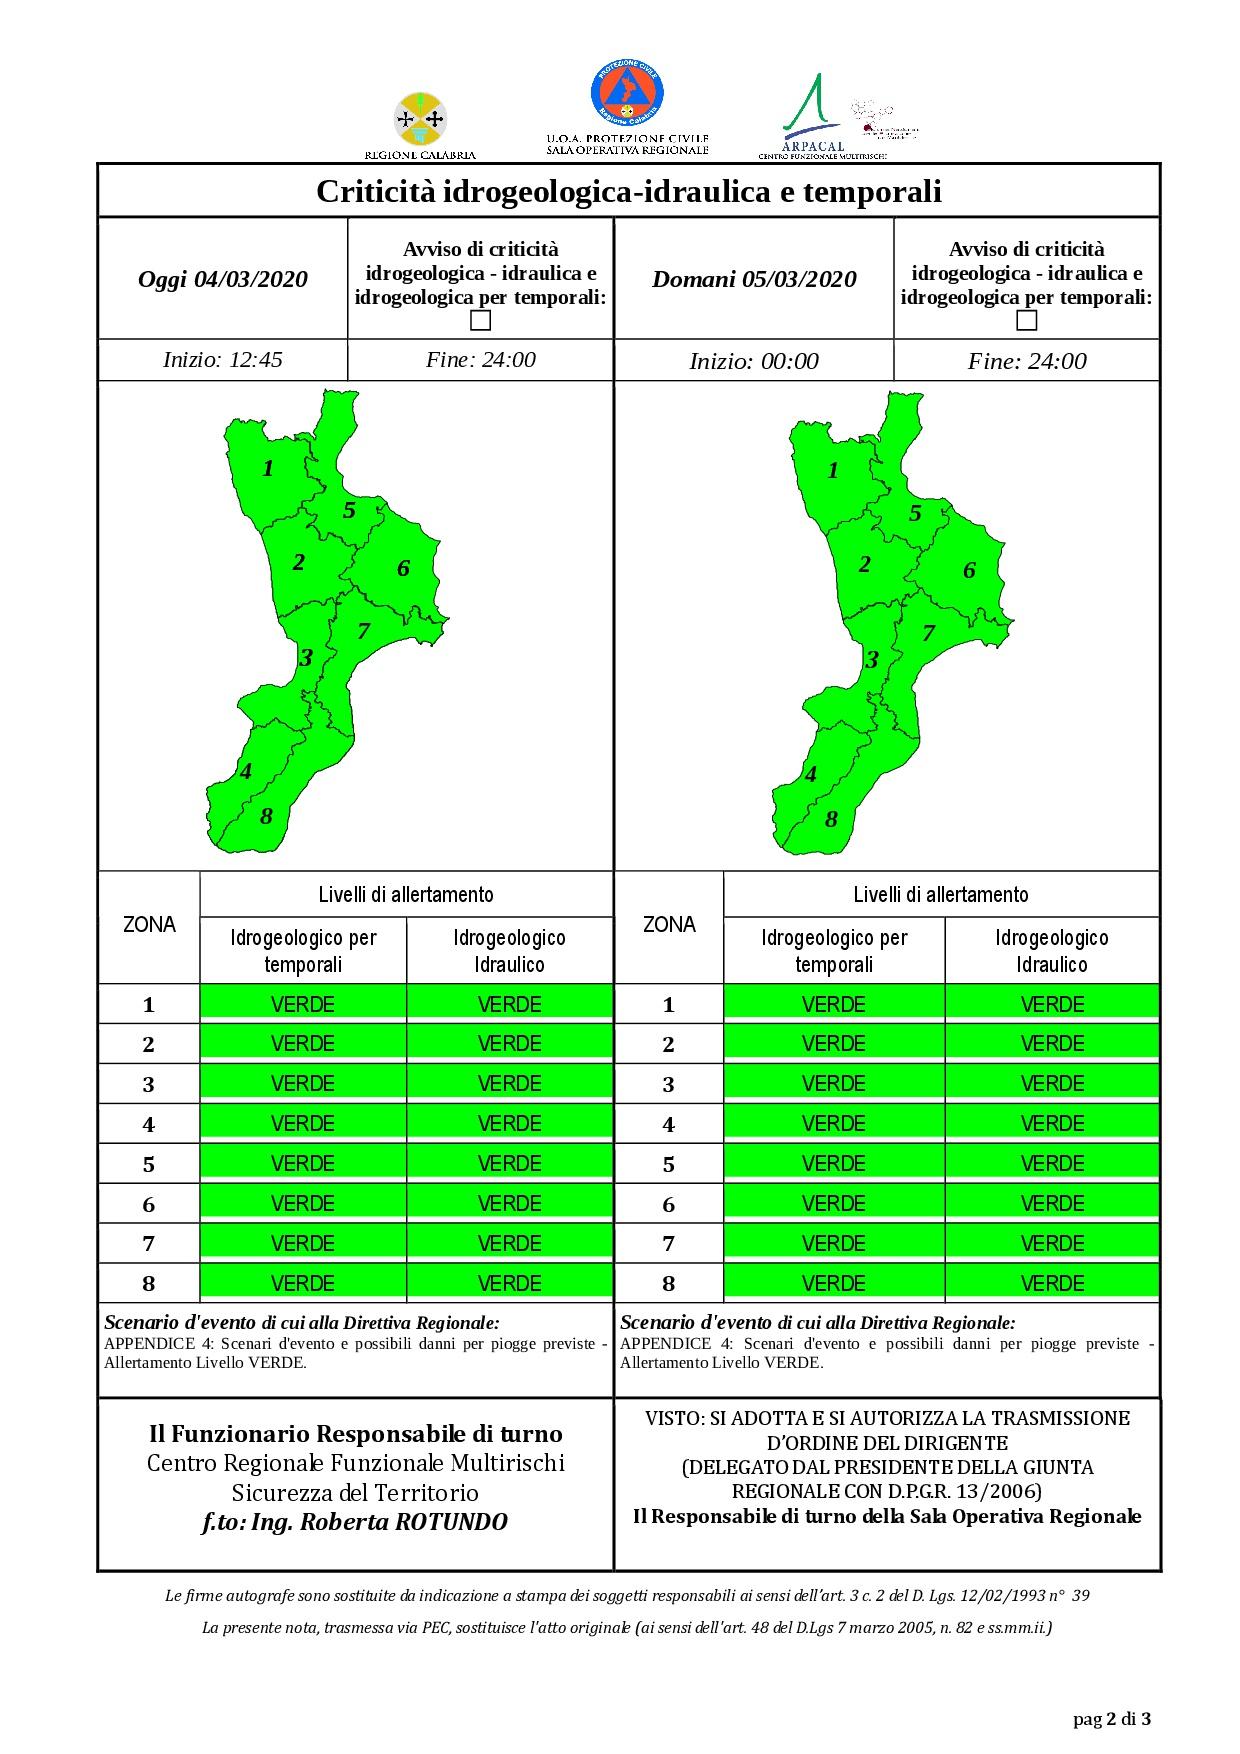 Criticità idrogeologica-idraulica e temporali in Calabria 04-03-2020